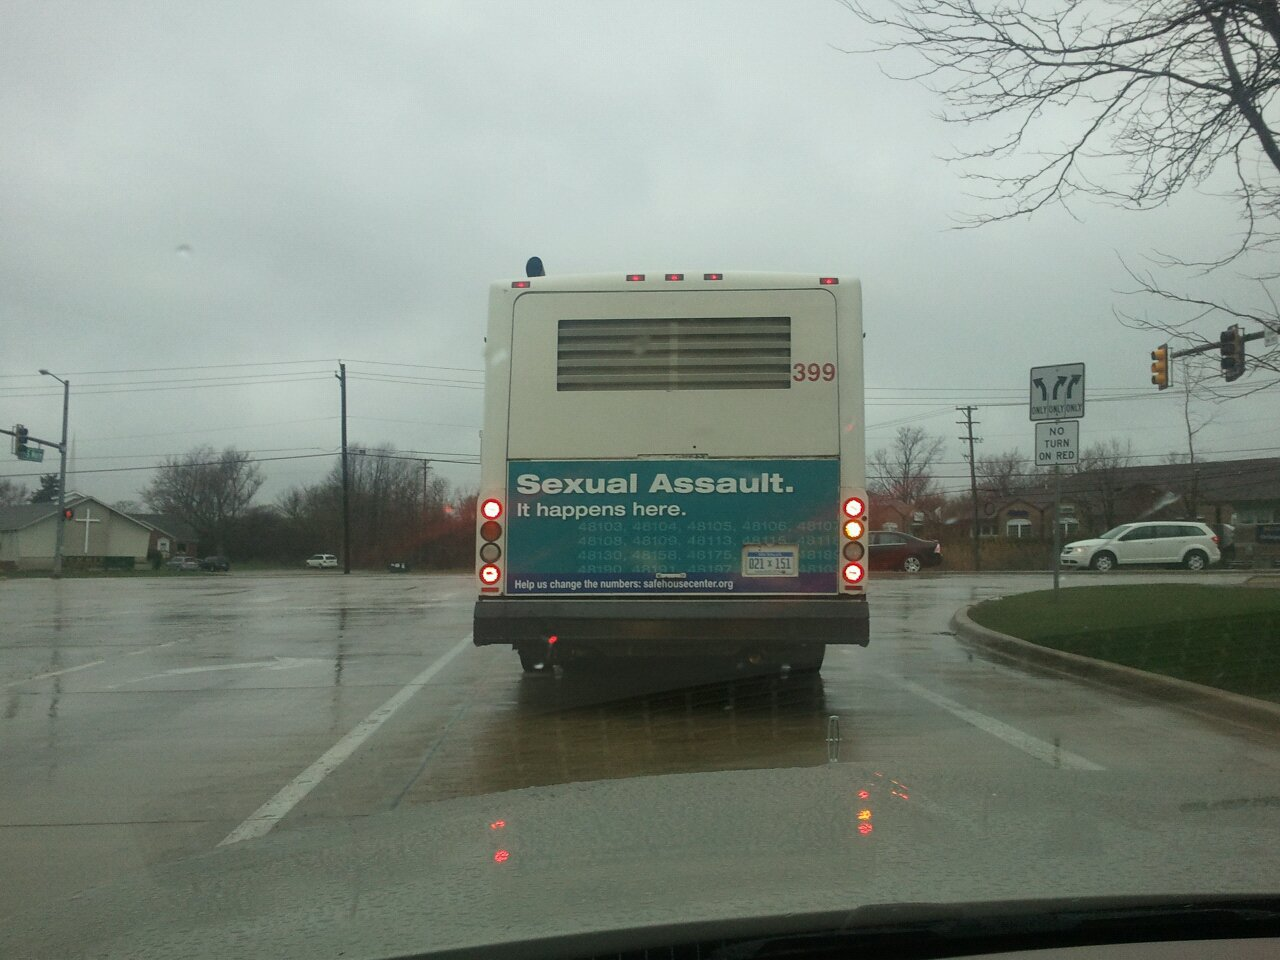 sexual assault notice bus